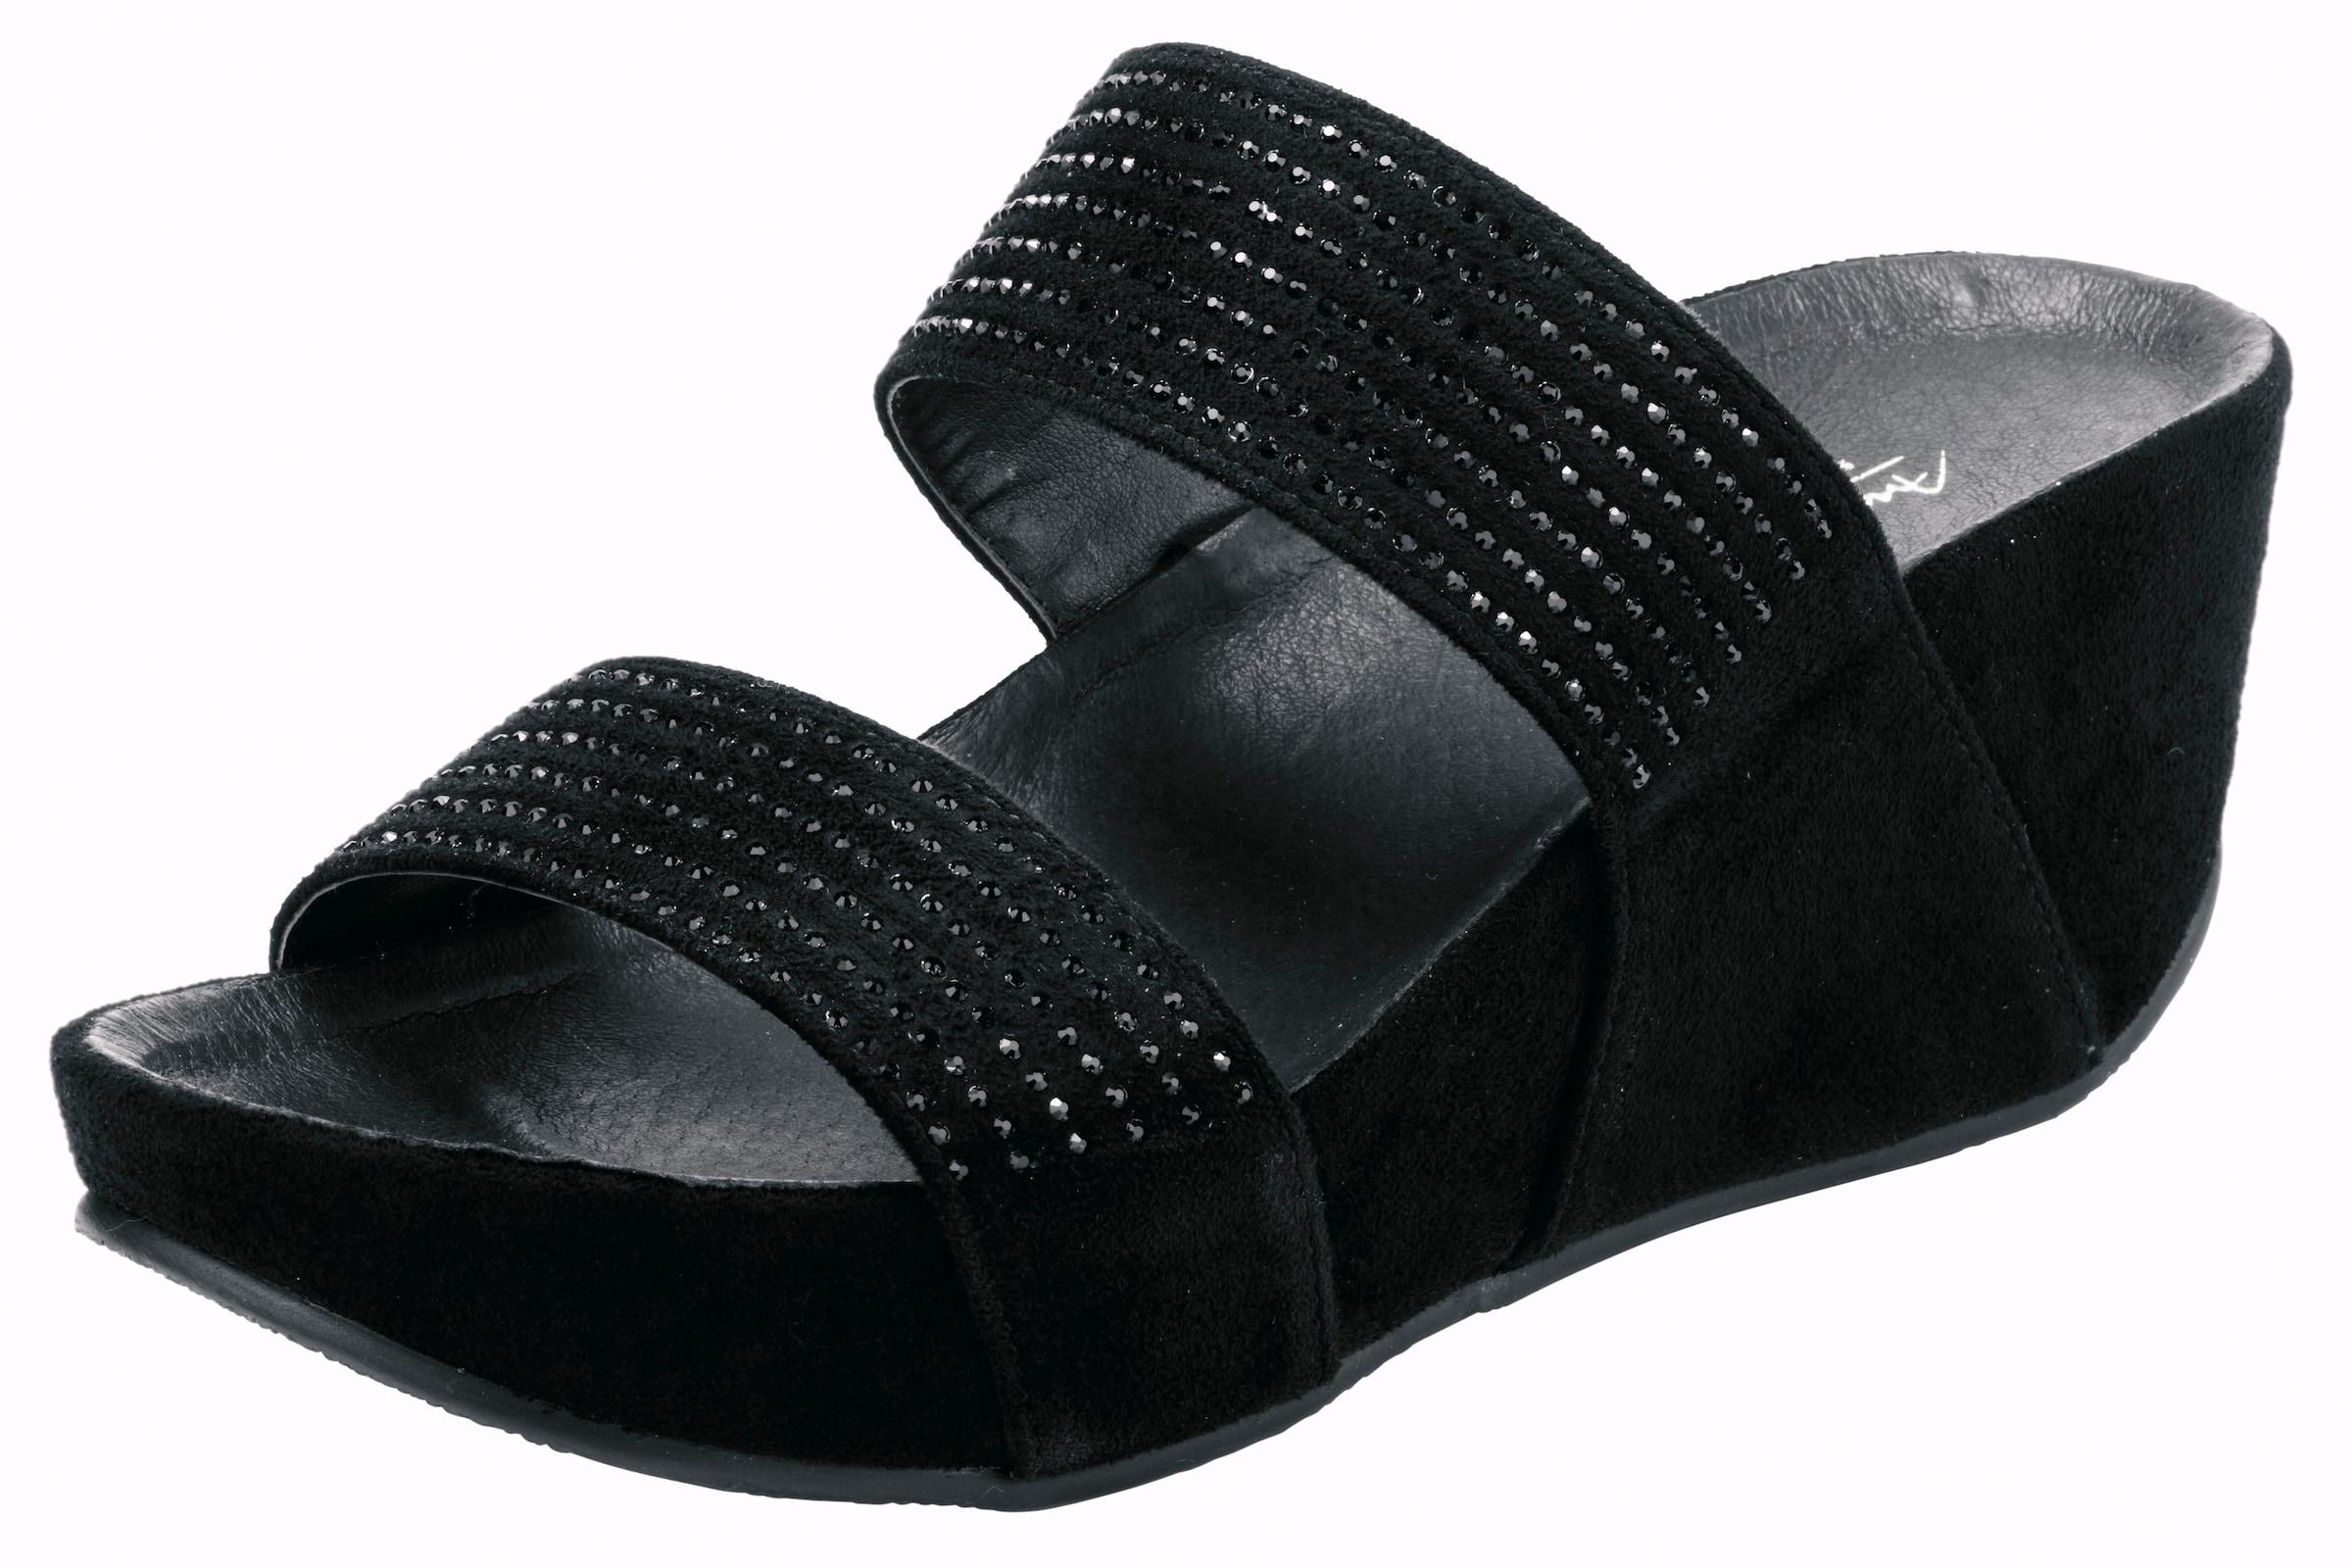 ANDREA CONTI Pantolette Günstige und langlebige Schuhe